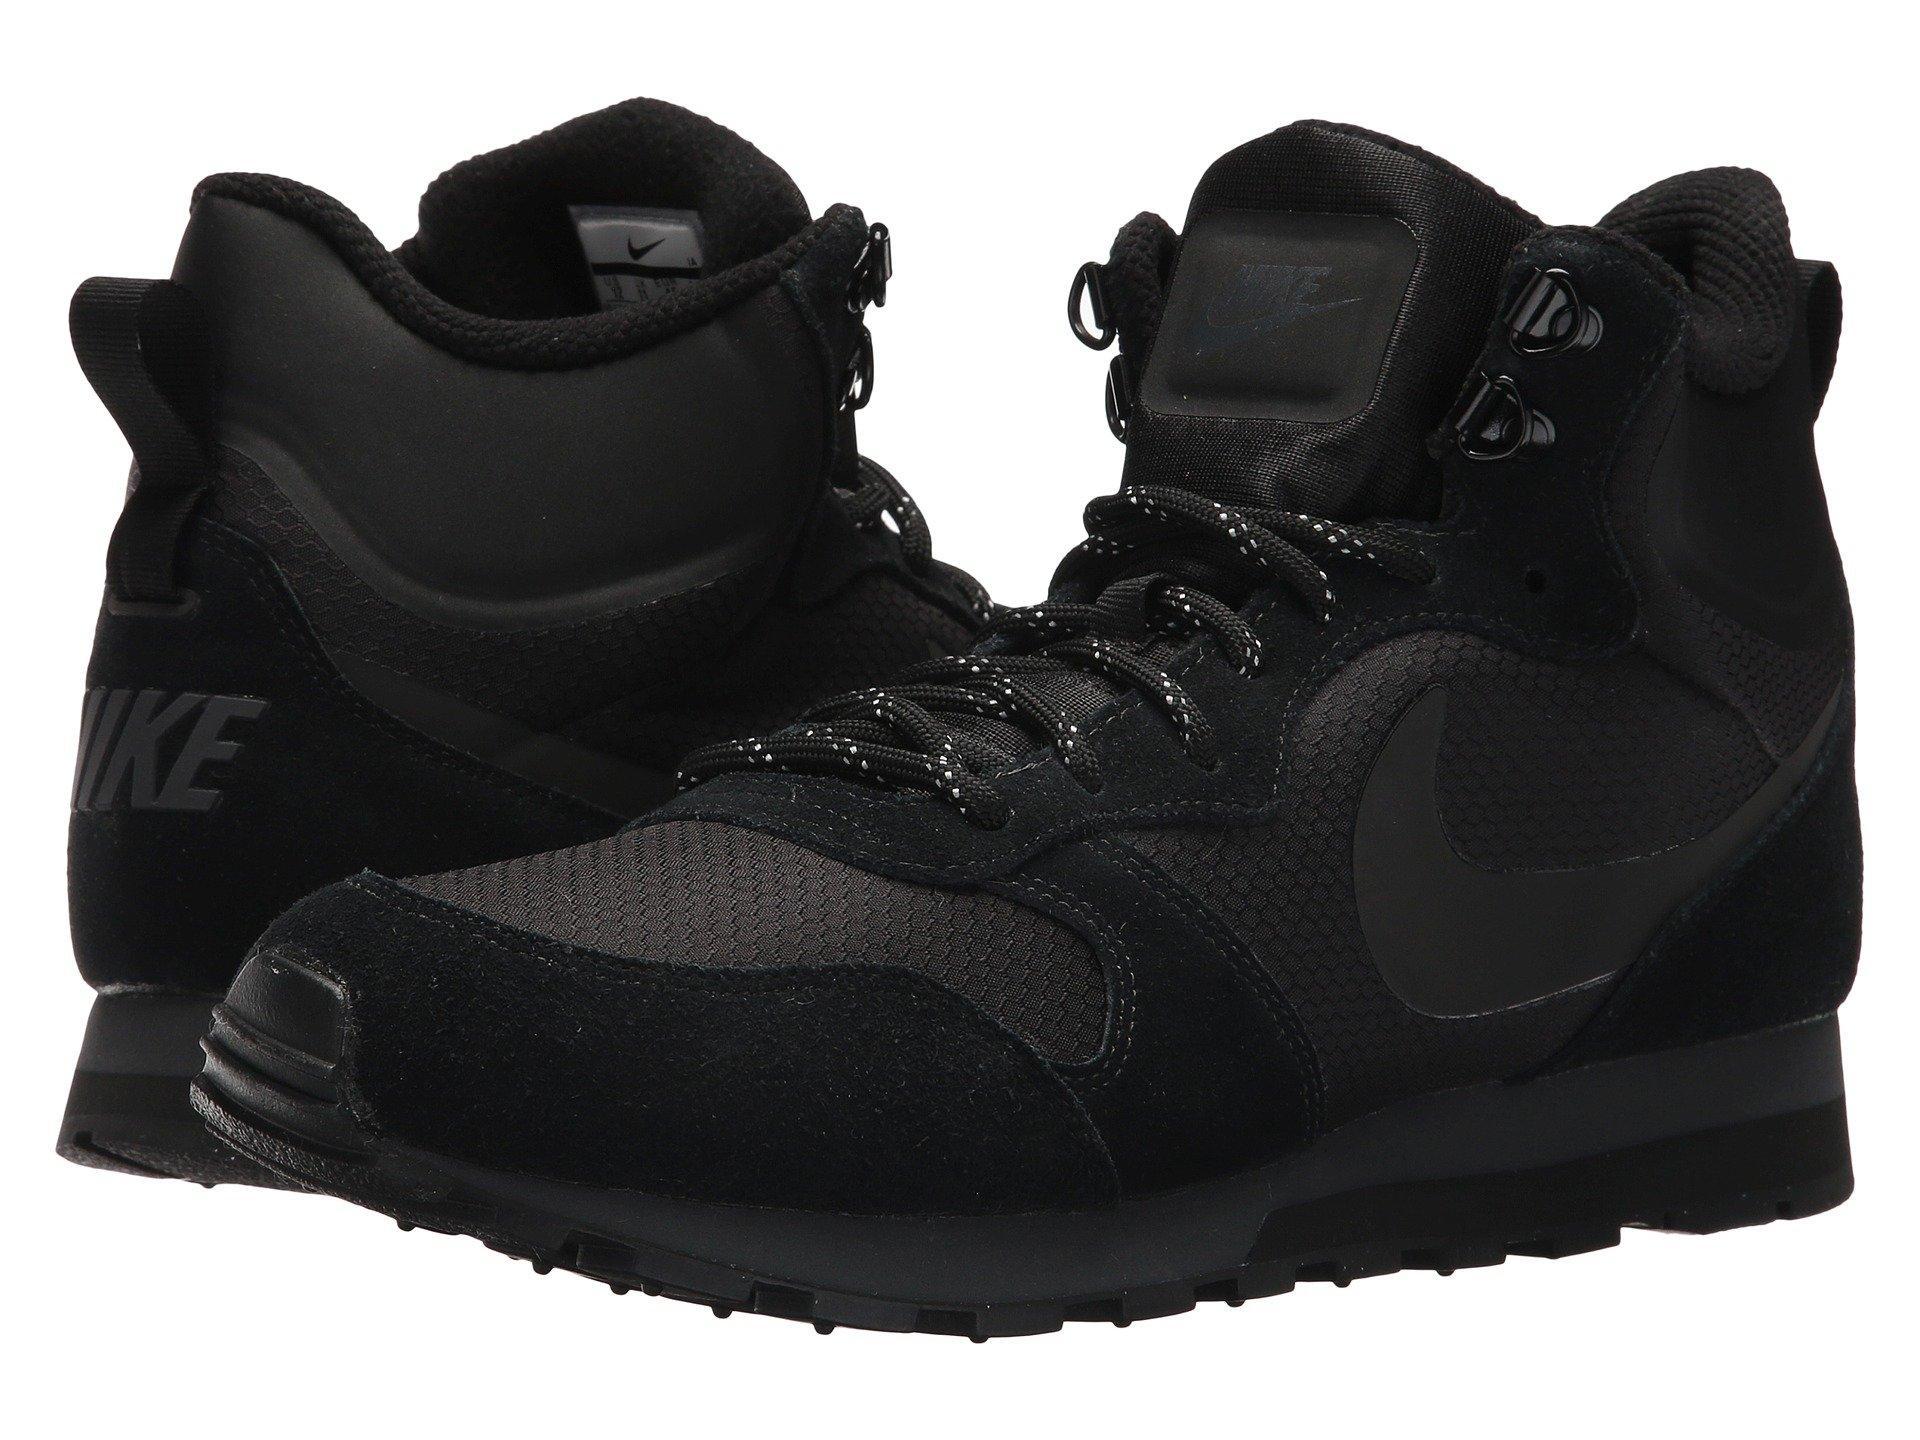 Tiranía Estricto Medición  Nike Md Runner 2 Mid Premium, Black/black/anthracite | ModeSens